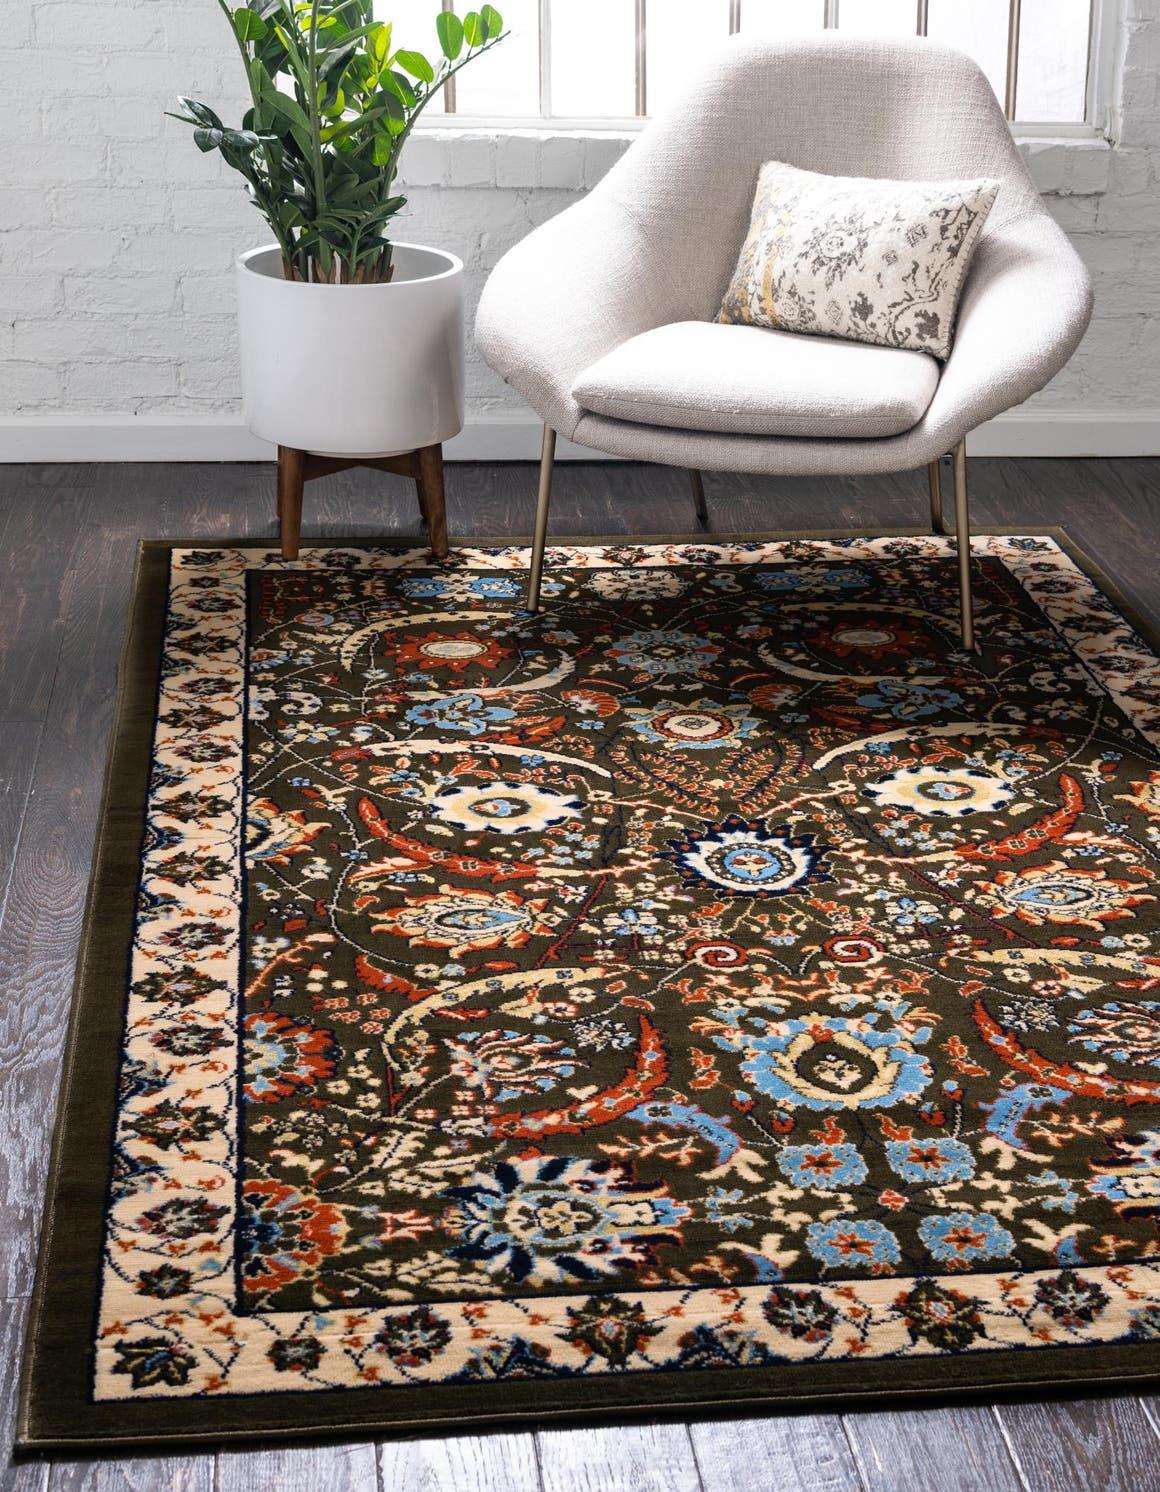 5' x 8' Isfahan Design Rug main image